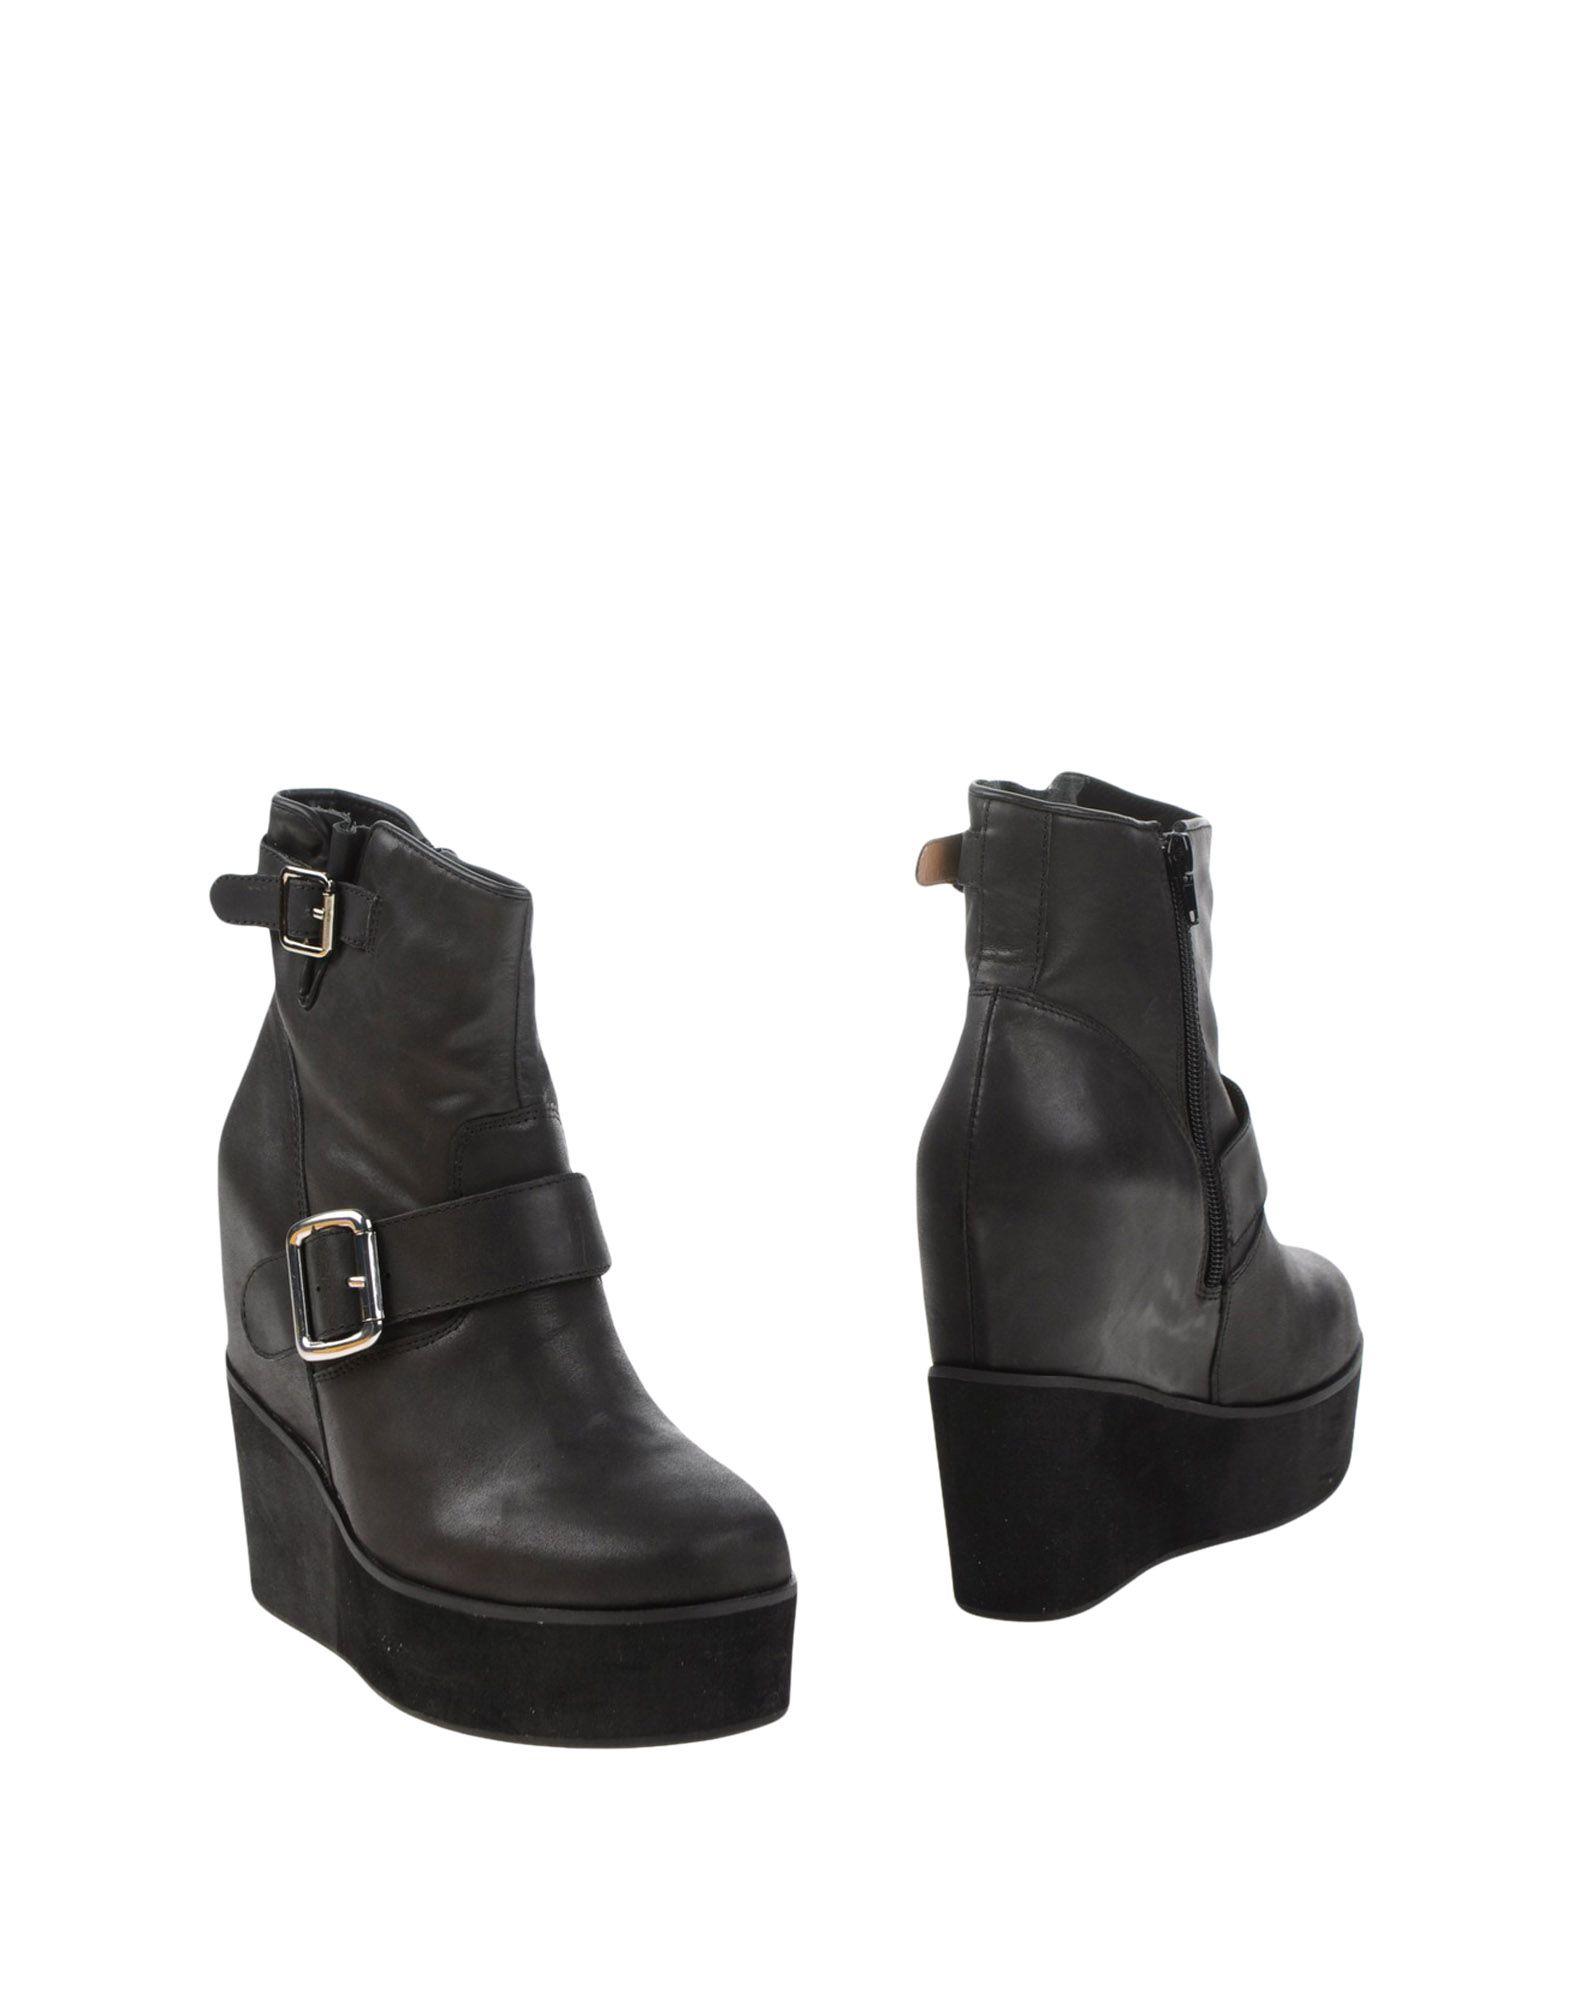 Jeffrey Campbell Stiefelette Damen  11214450SK Gute Qualität beliebte Schuhe